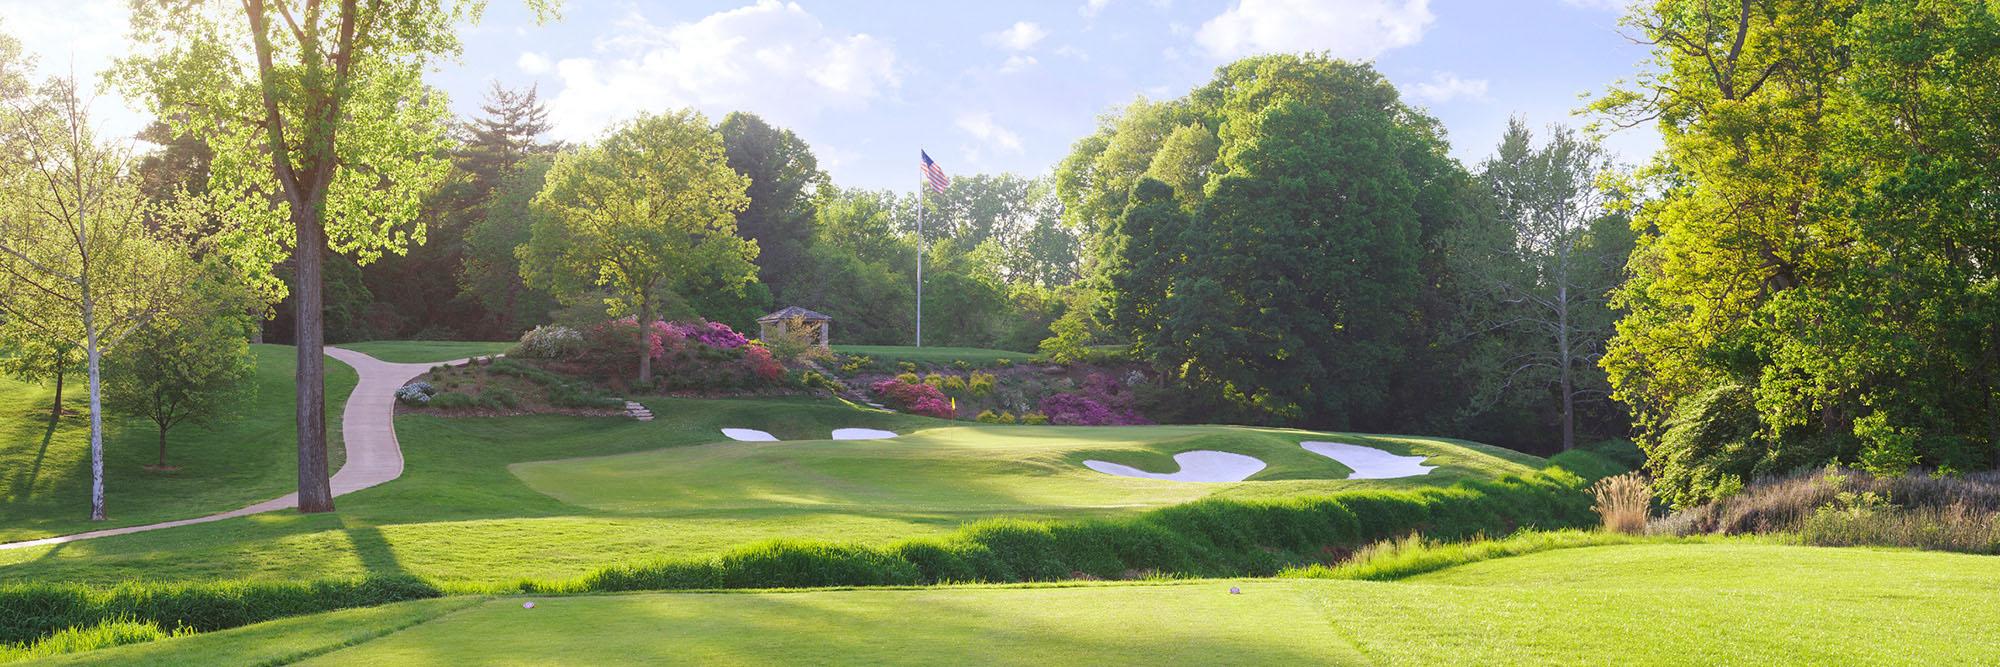 Golf Course Image - Bellerive No. 13